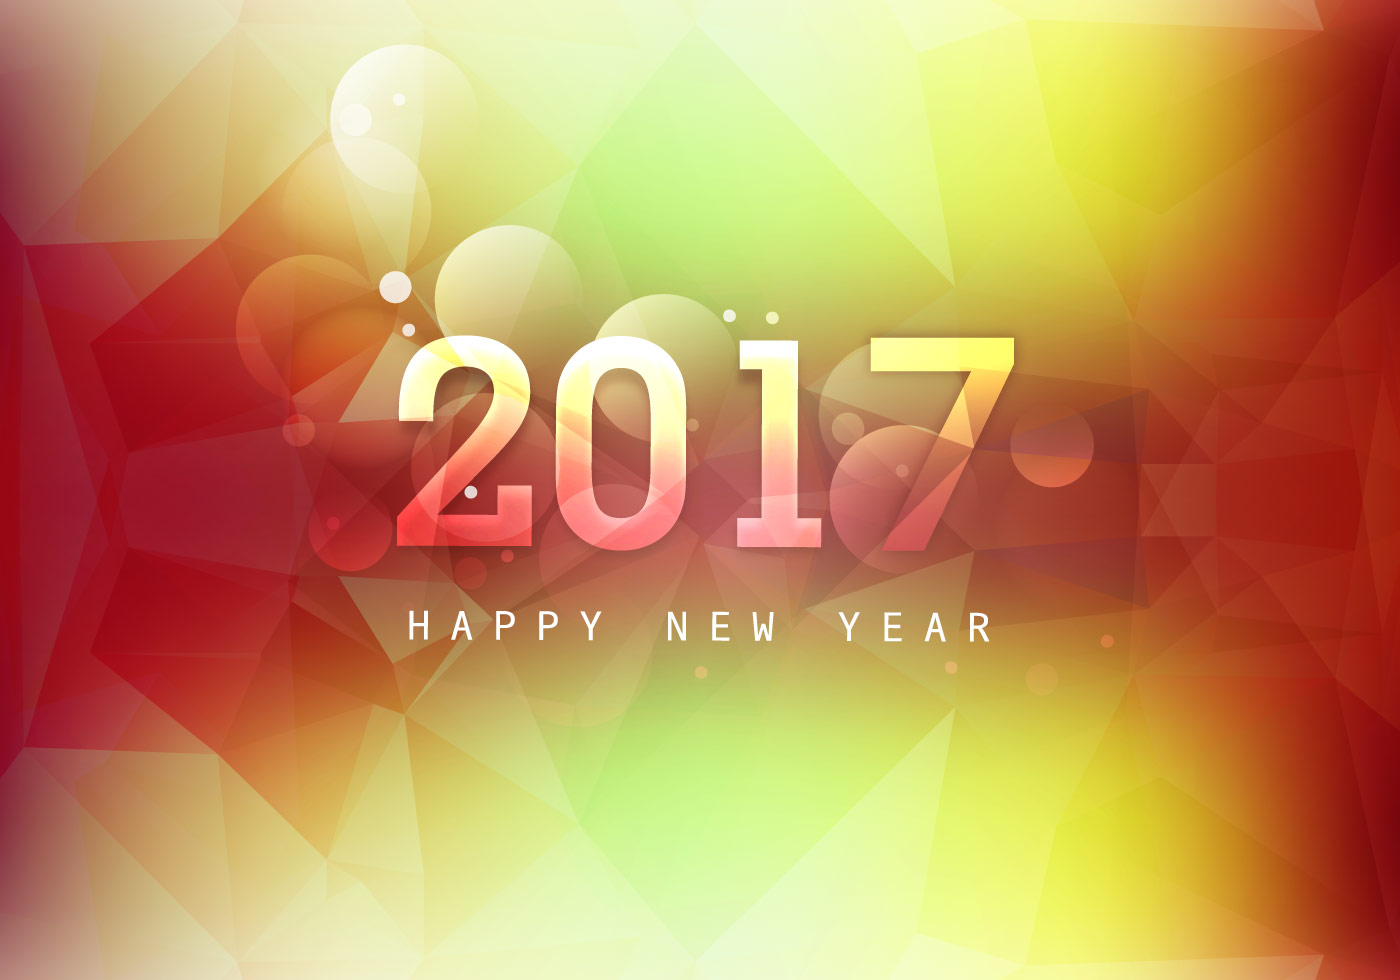 Glowing Happy New Year 2017